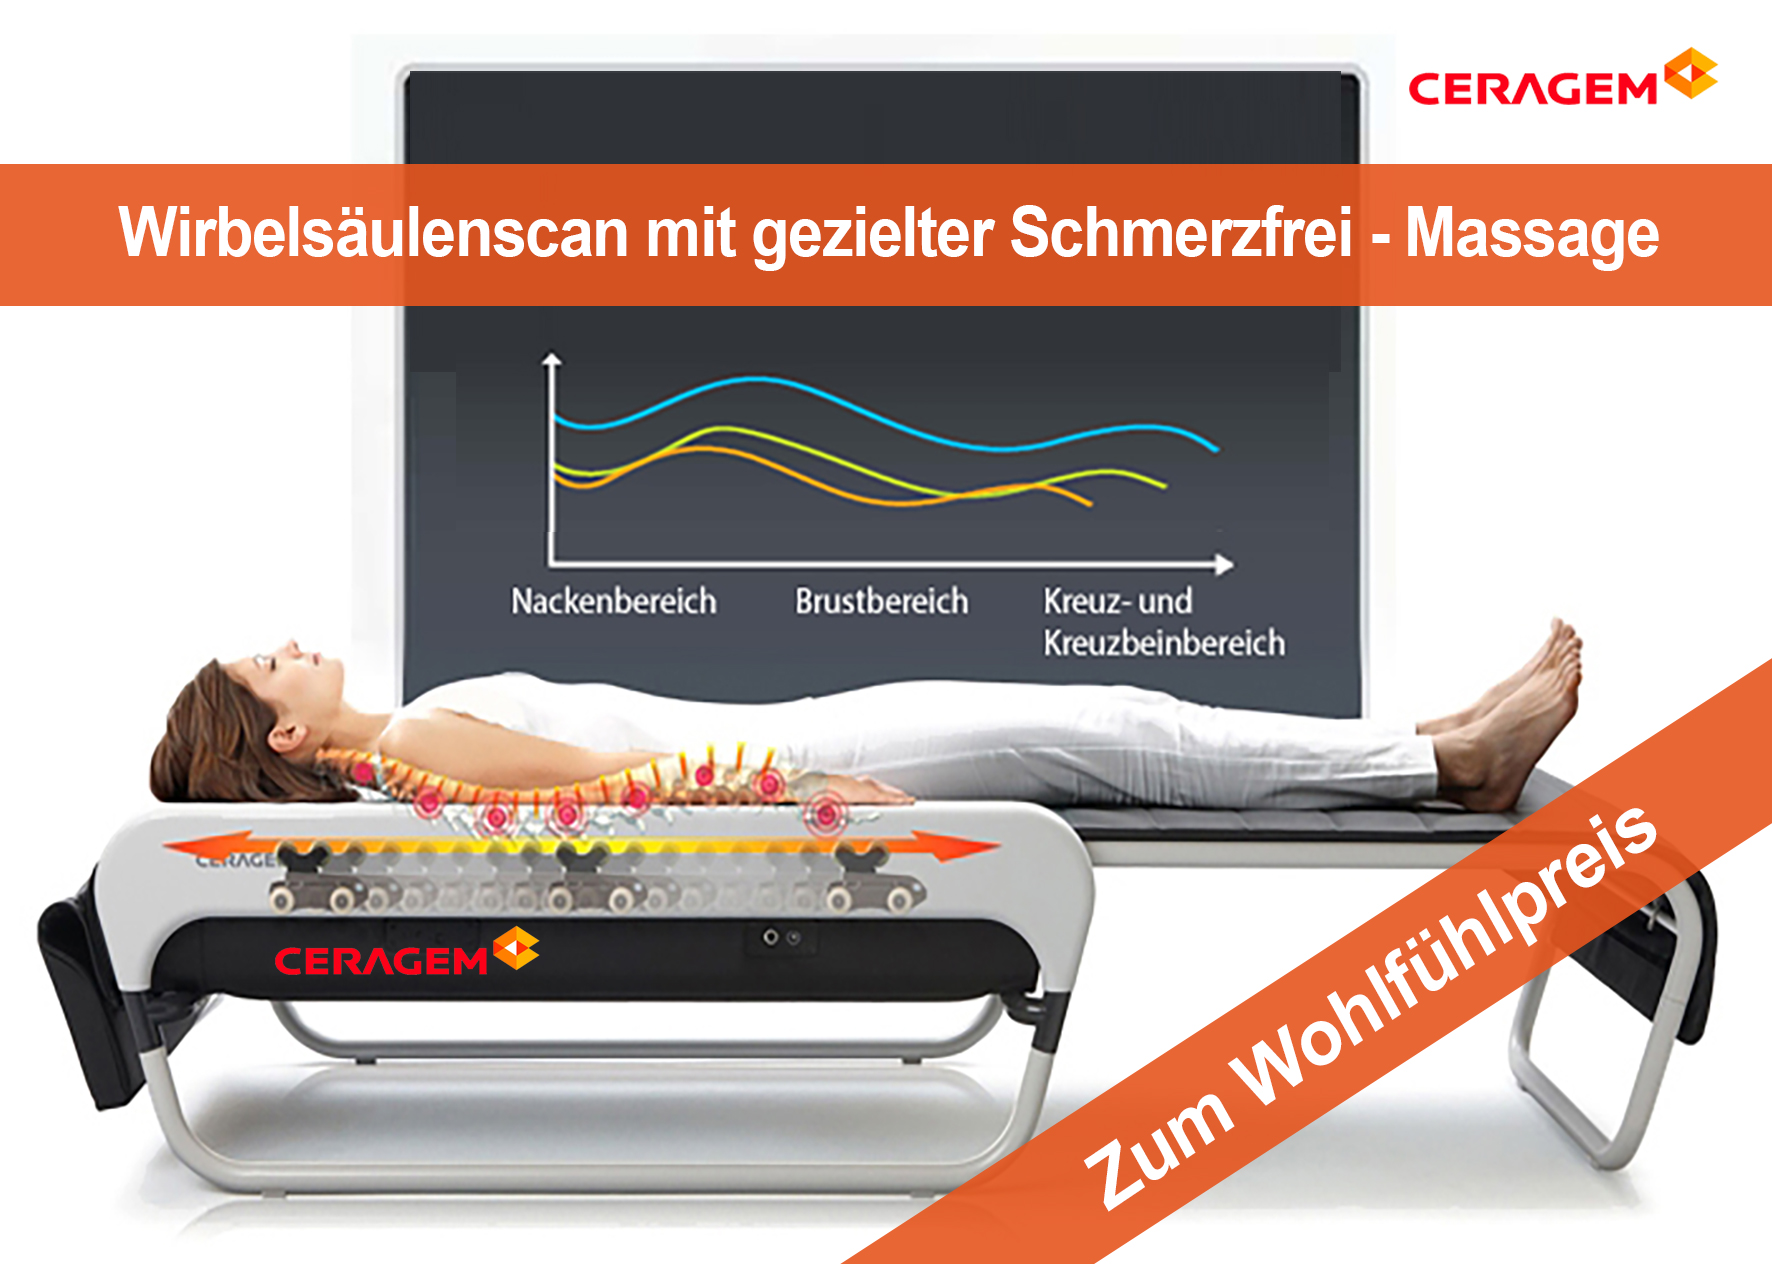 RE.VITAL GmbH